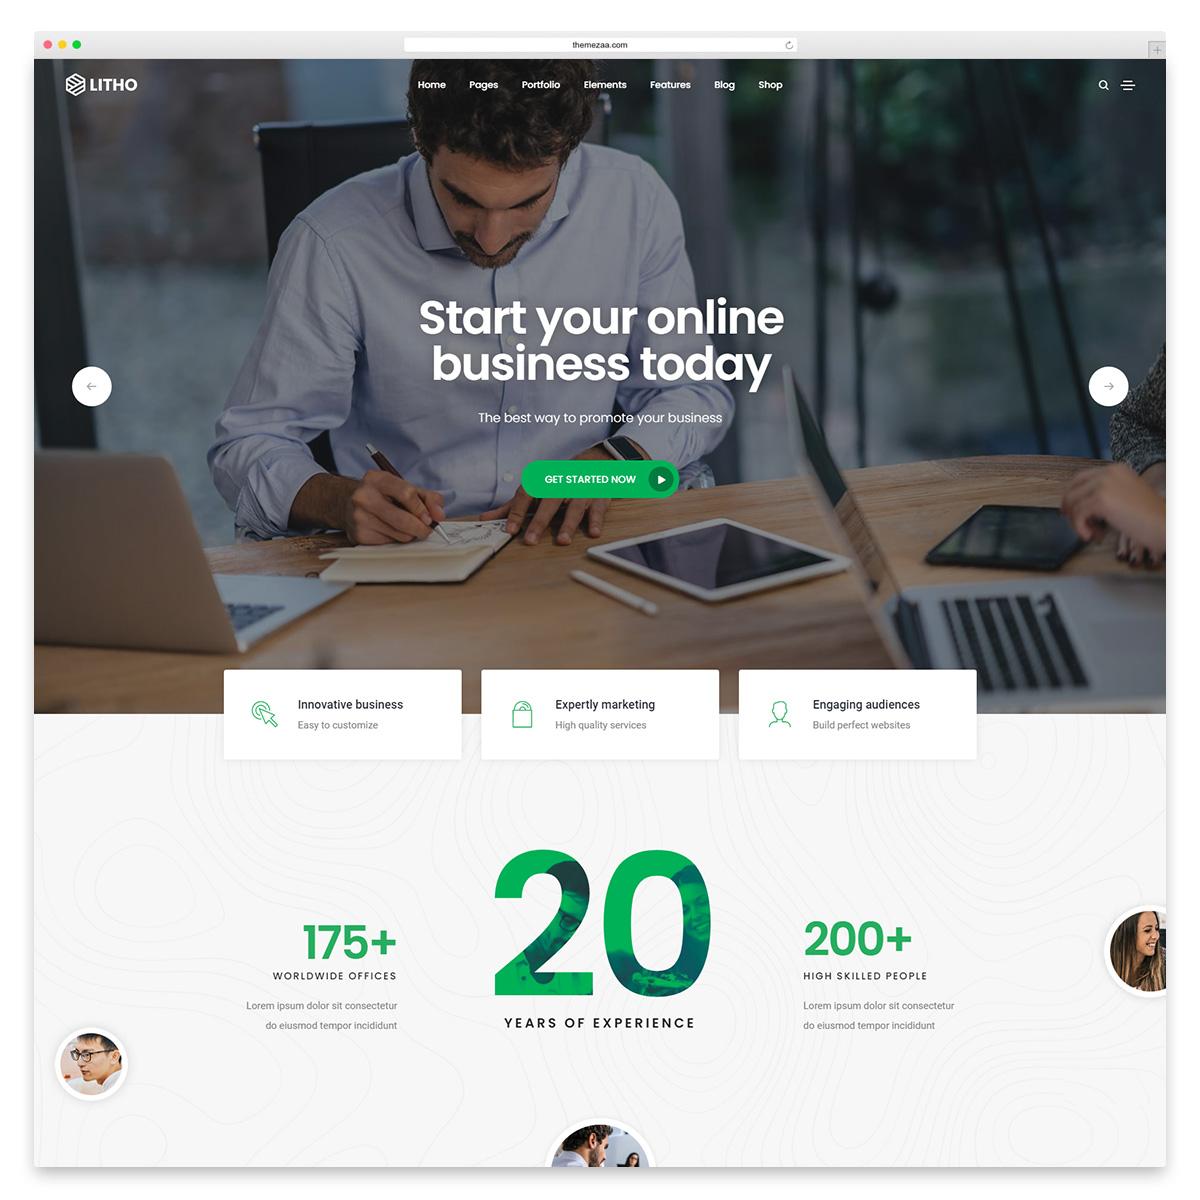 litho startup wordpress theme